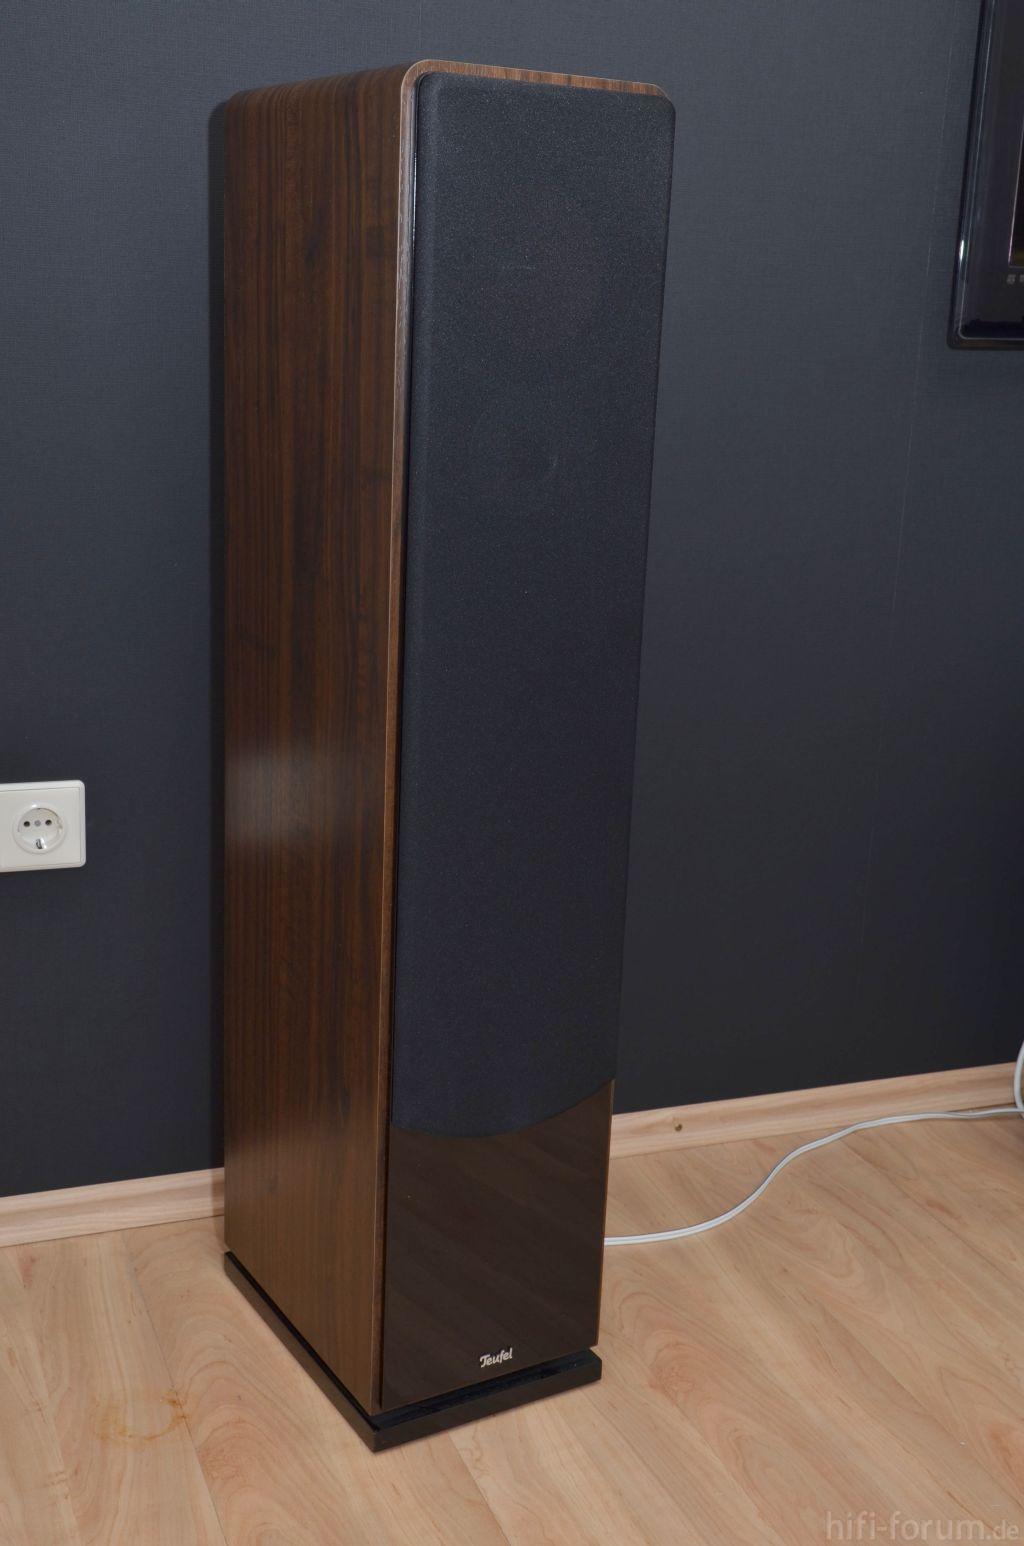 ls1 ls1 hifi bildergalerie. Black Bedroom Furniture Sets. Home Design Ideas